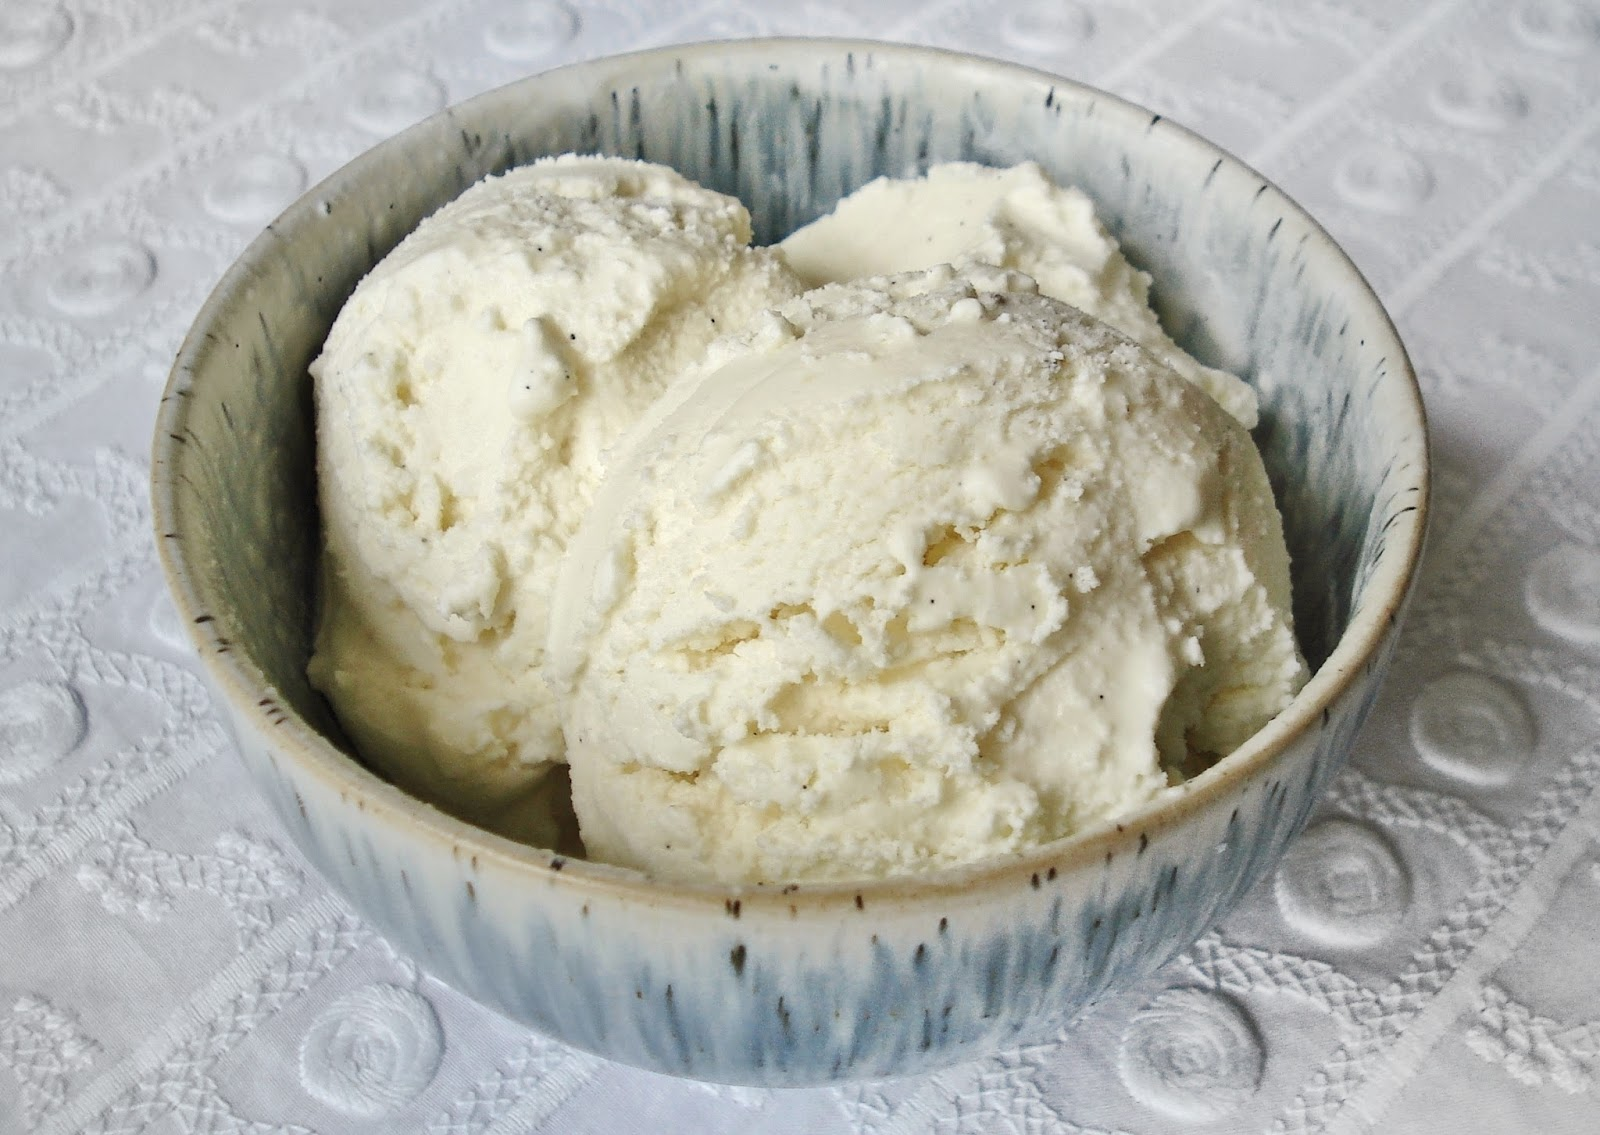 Gluten Free SCD and Veggie: Vanilla - Vanilla Ice Cream GF SCD